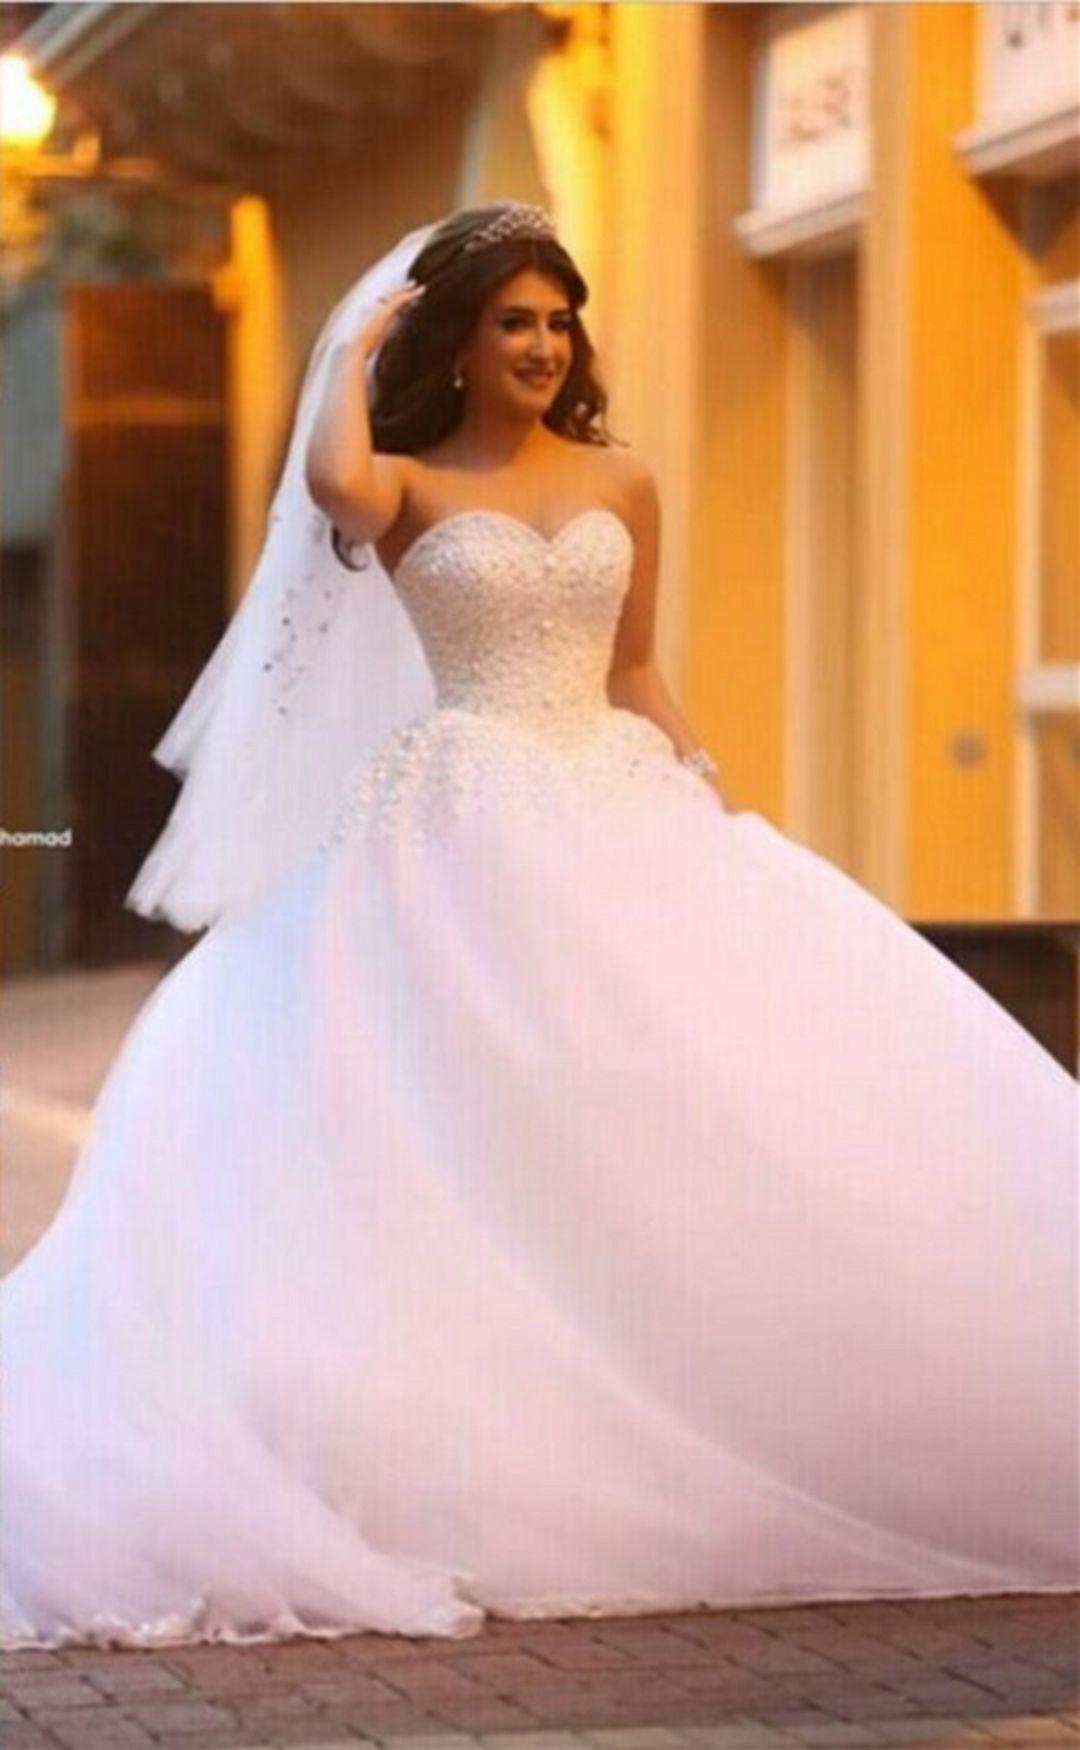 15+ Wedding Dresses Ball Gown Flowers Ideas